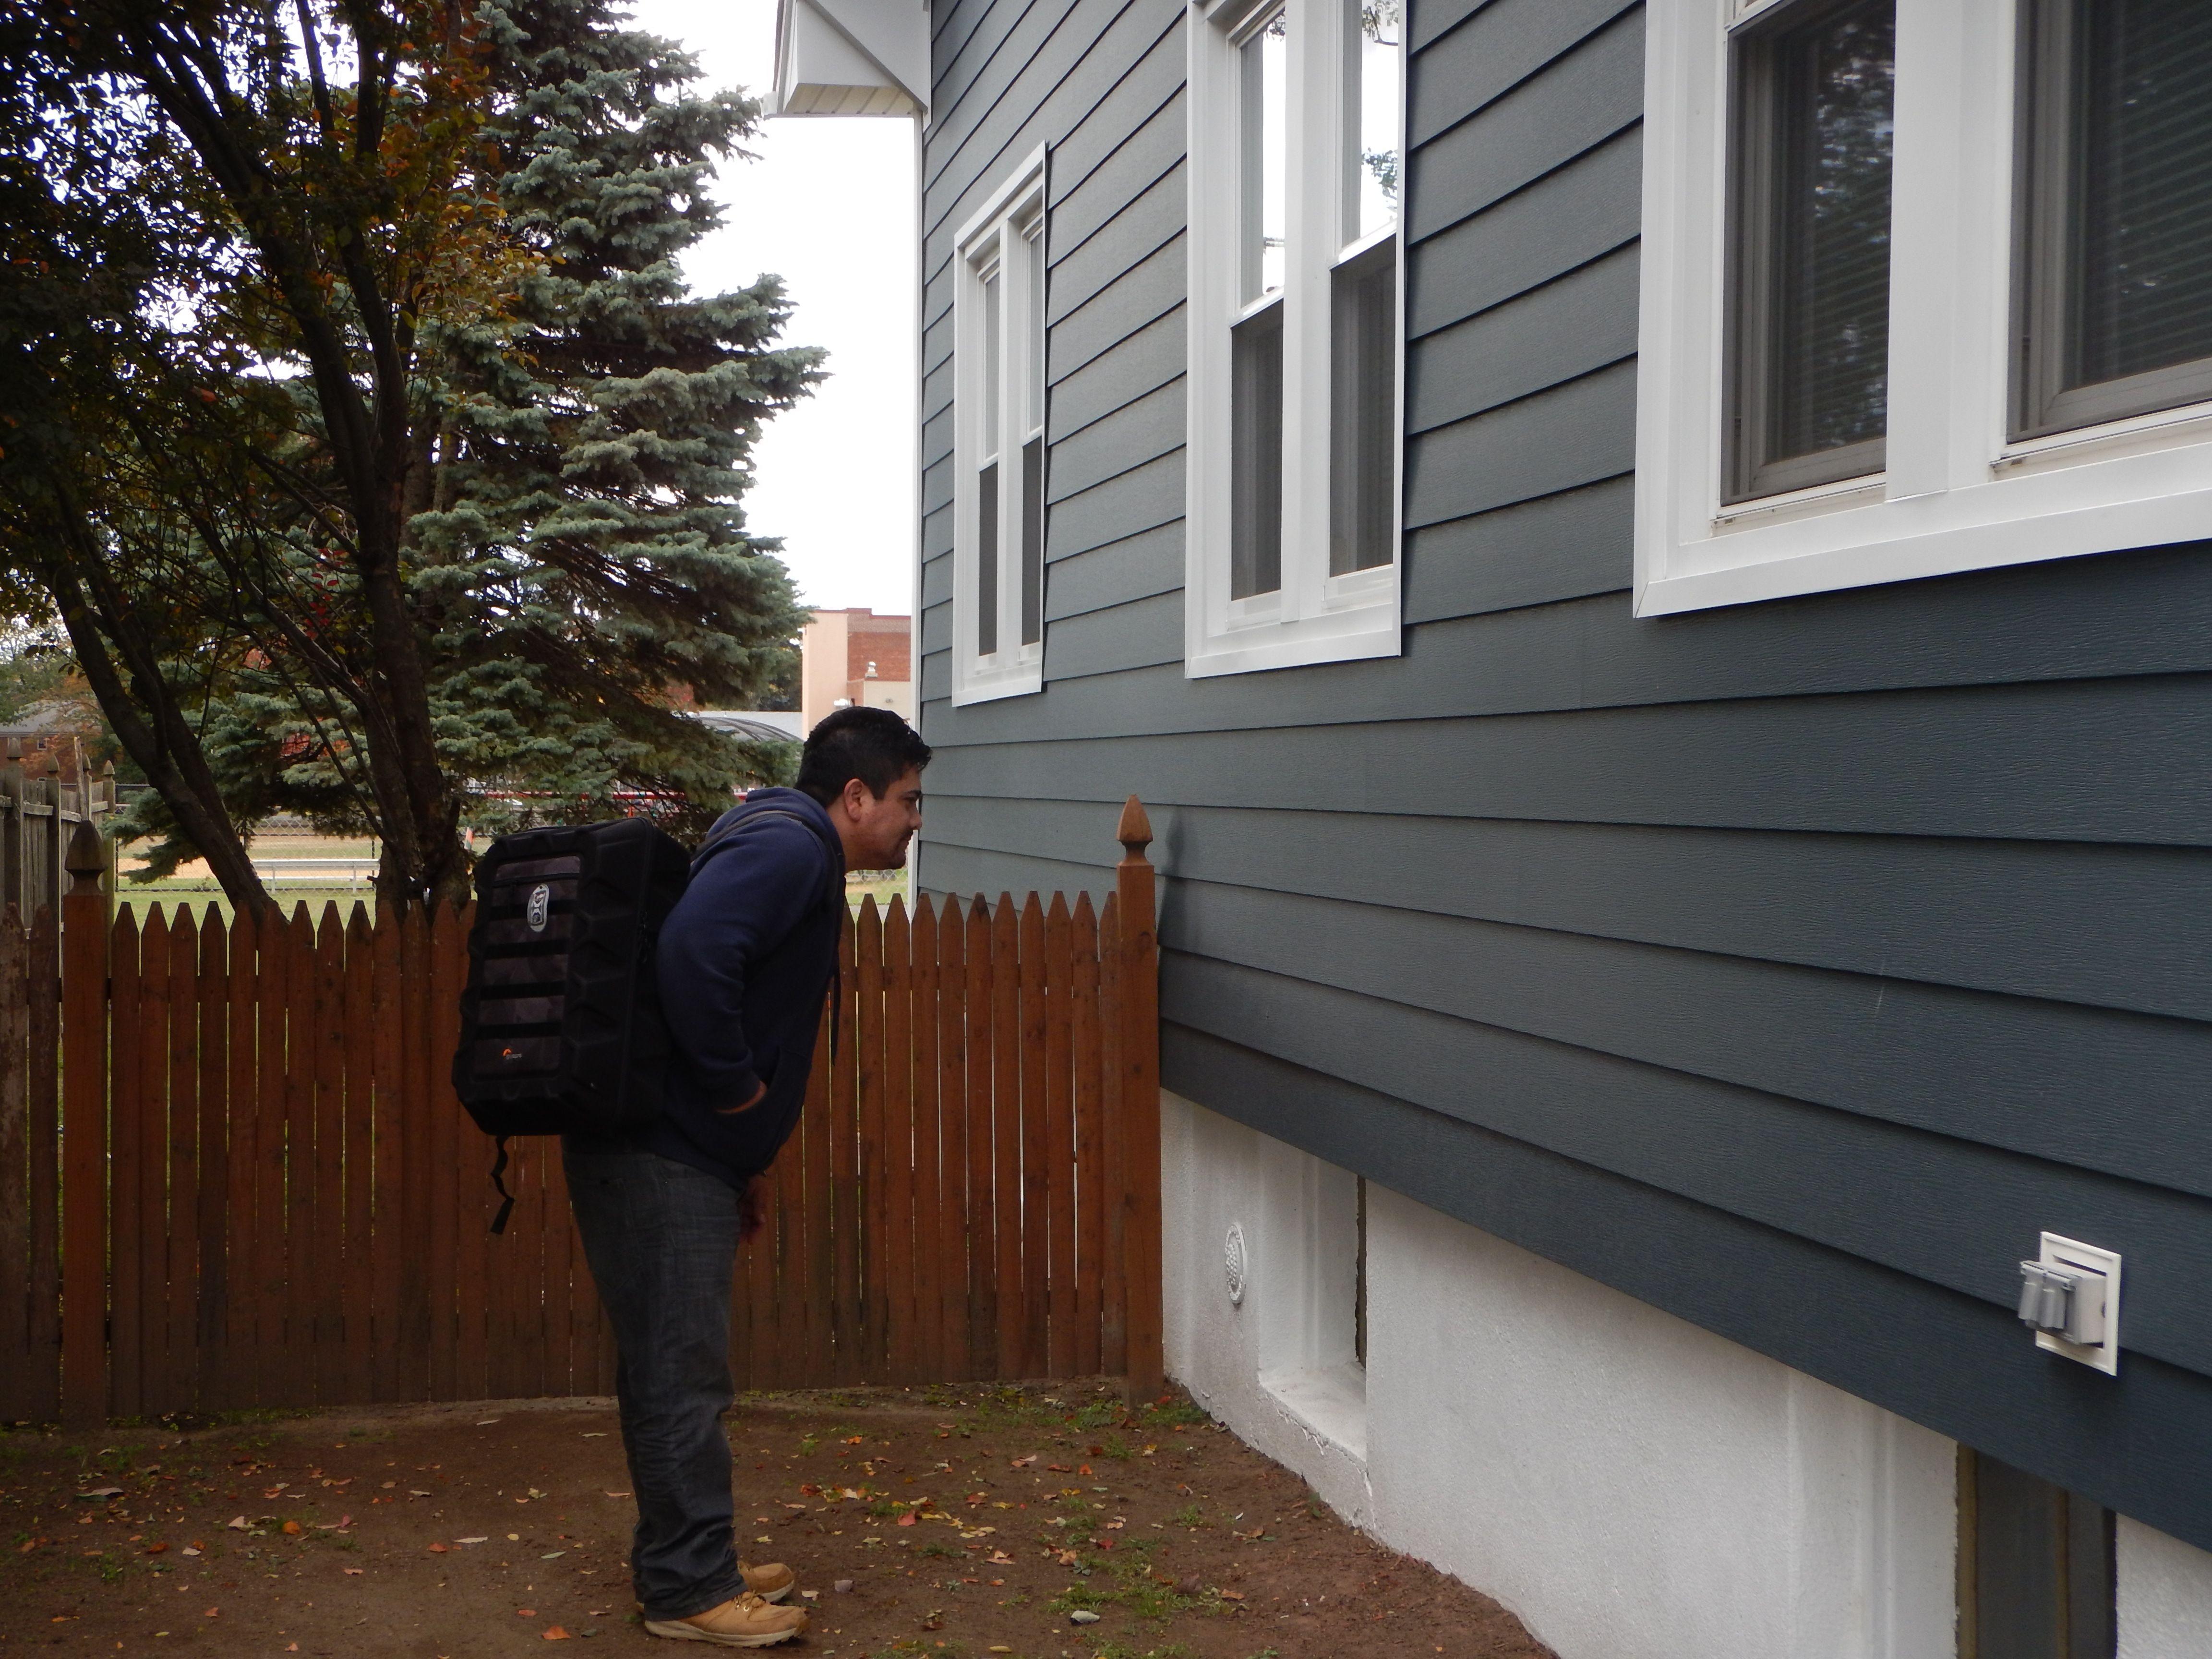 Call 973 795 1627 Vinylsiding Passaic Vinyl Siding New Jersey Passaic Newjerseysiding Passaic Siding Vinyl Siding Siding Contractors Siding Exterior Siding